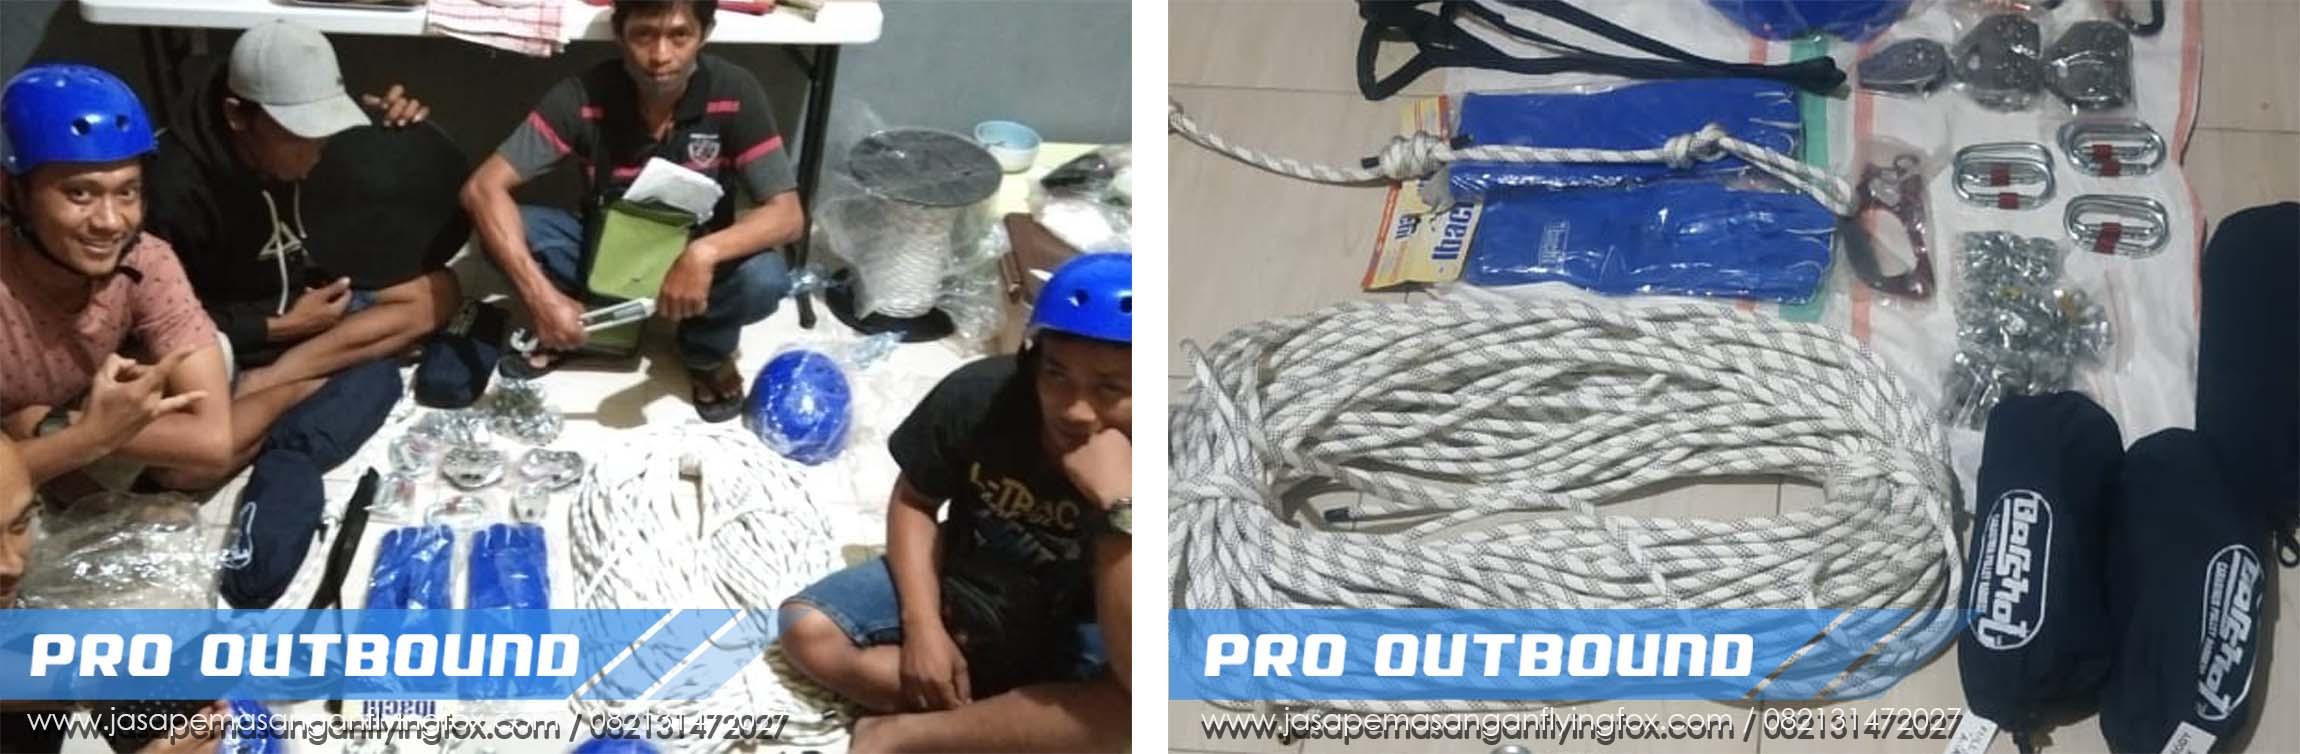 Kelompok Usaha Perhutanan Sosial (KUPS) Ekowisata Bluluk Mas Lamongan, Penjual Alat Flying Fox Malang - 082131472027 (1)